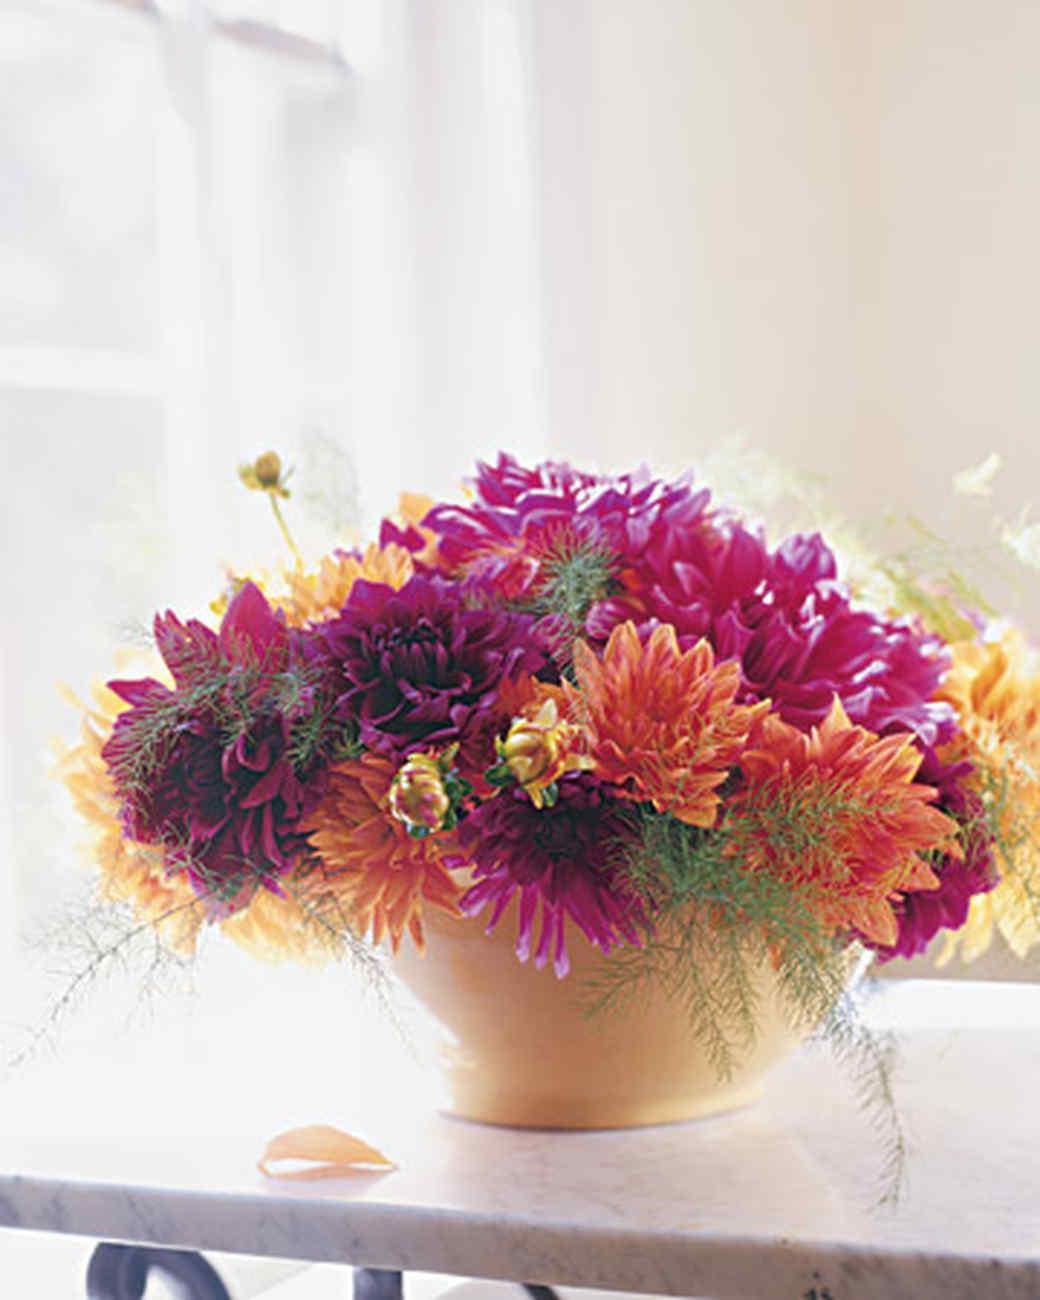 ceramic flower frog vase of marthas flower arranging secrets martha stewart for mla101098 0605 pink dahlia xl